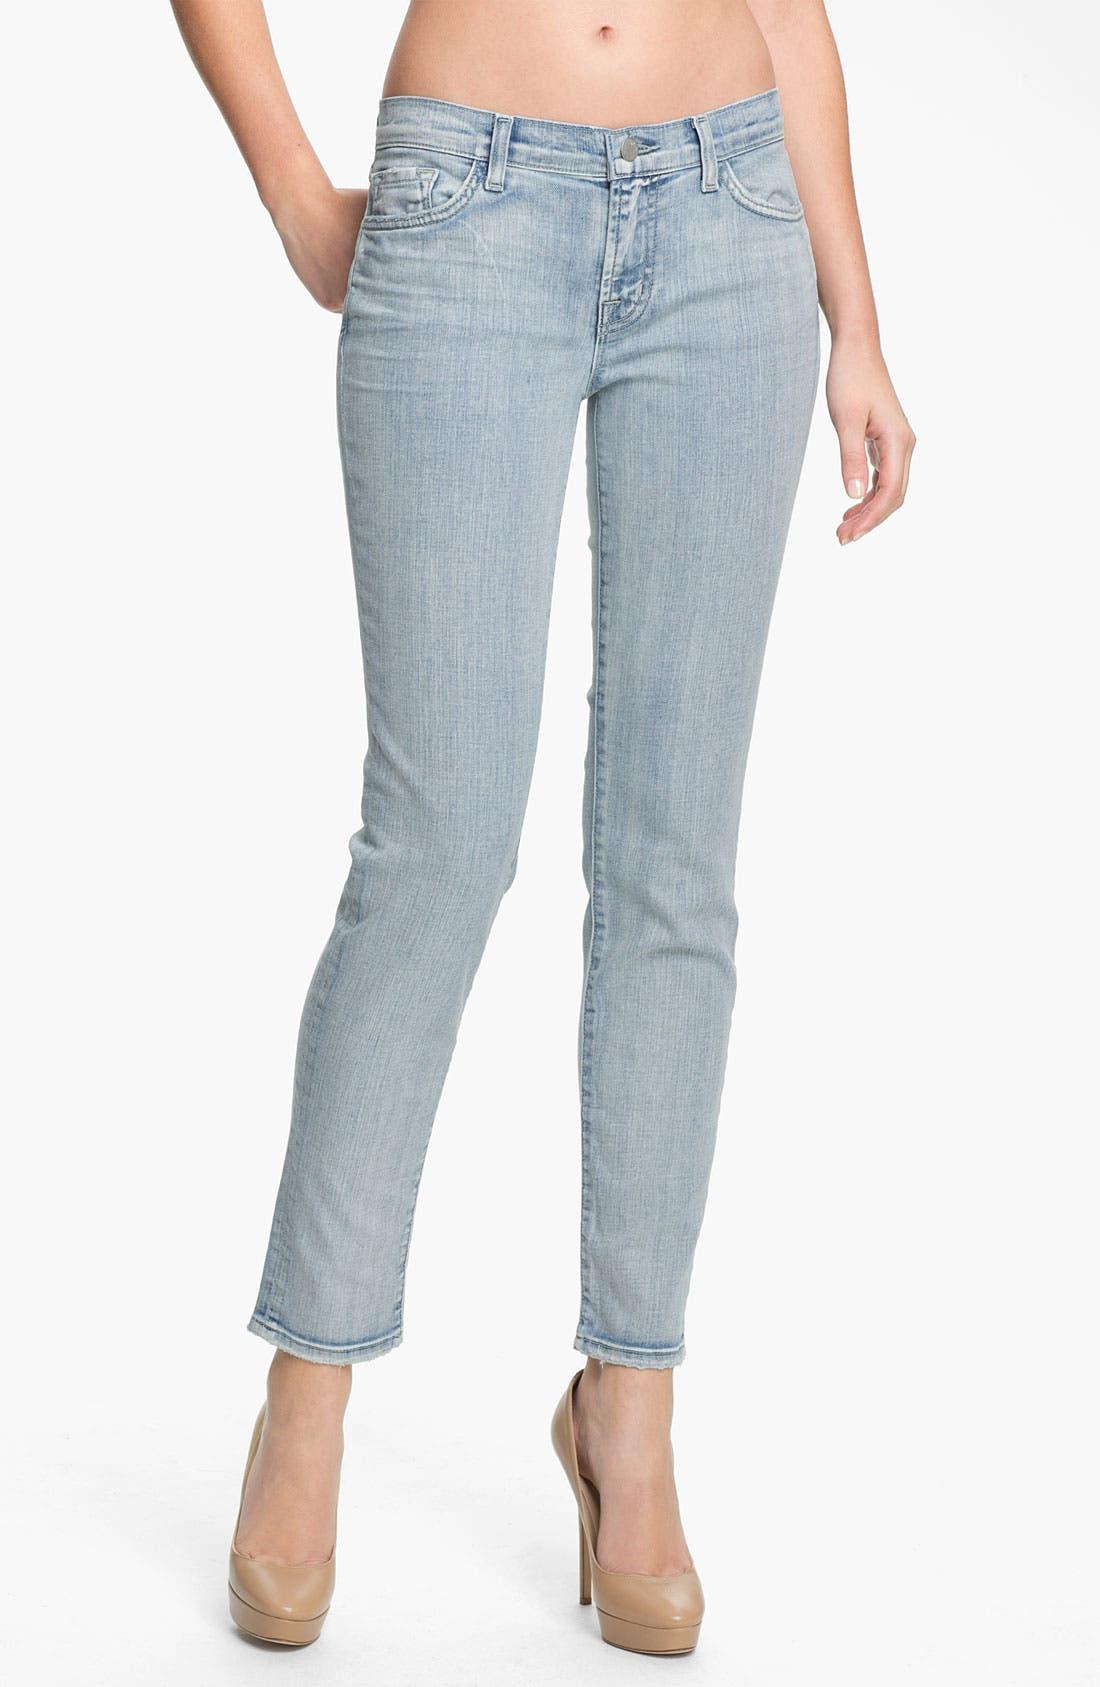 Main Image - J Brand '811' Skinny Stretch Jeans (Afterlife)